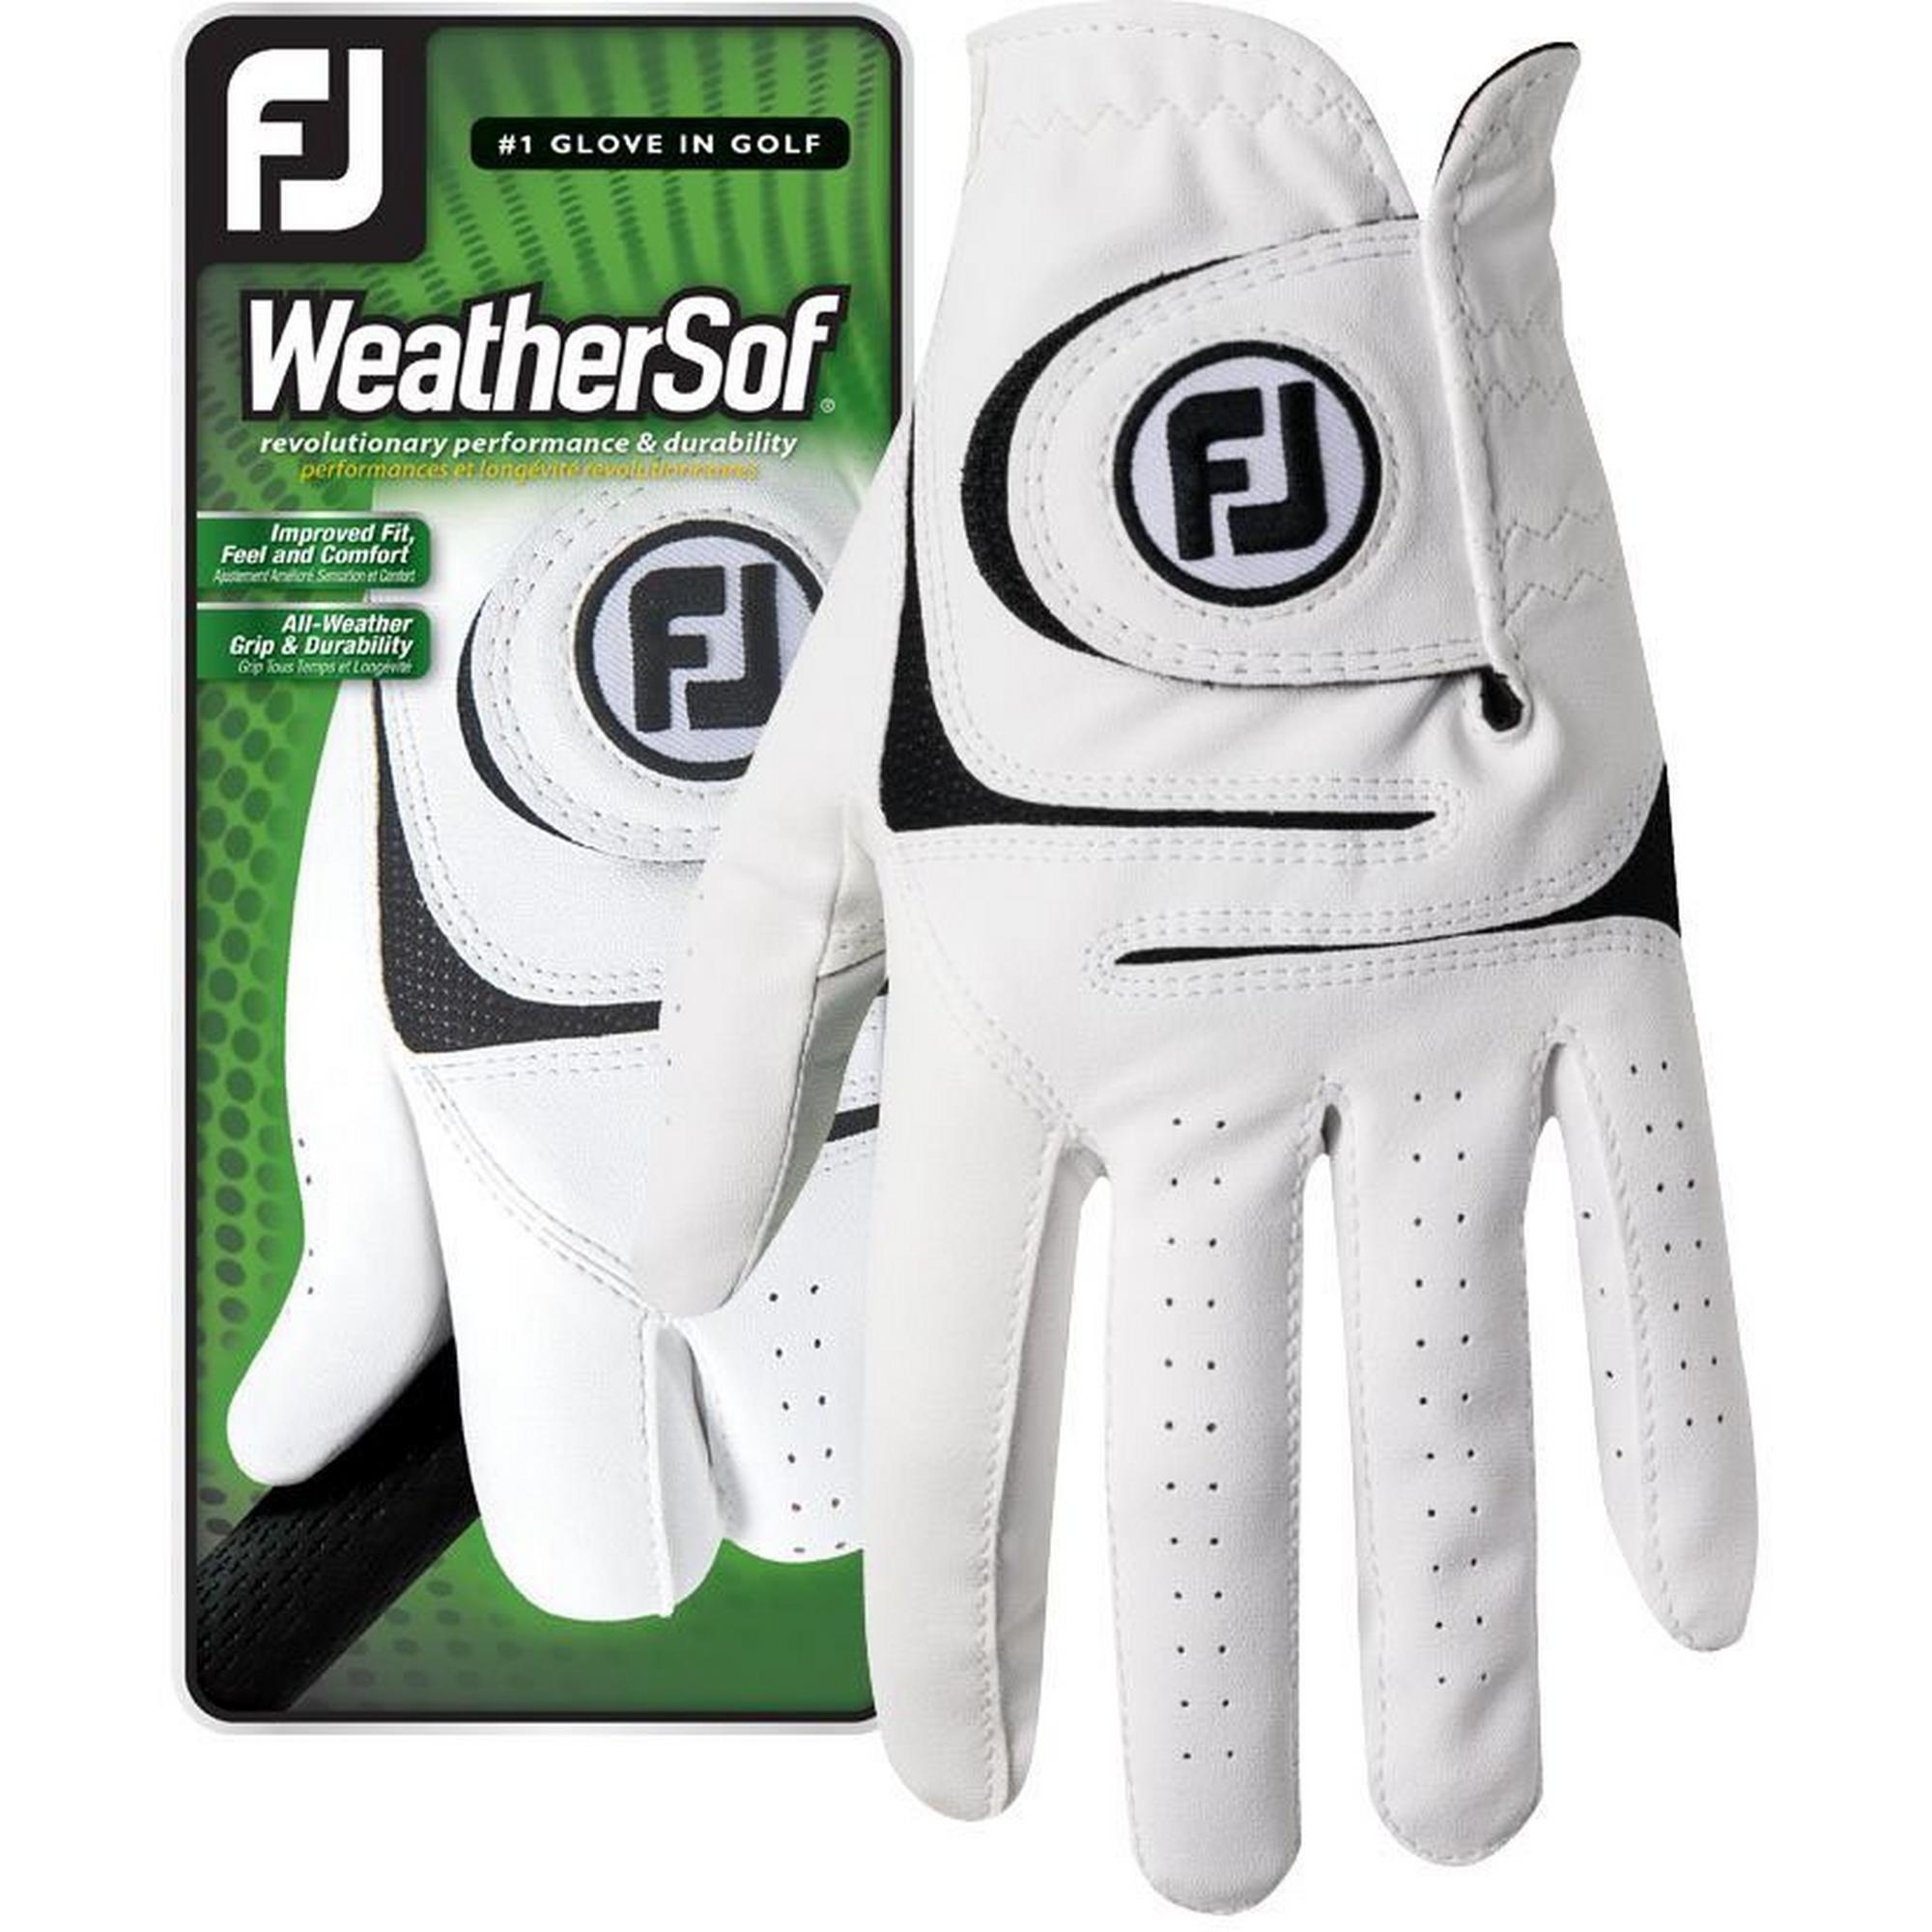 Womens WeatherSof Golf Glove